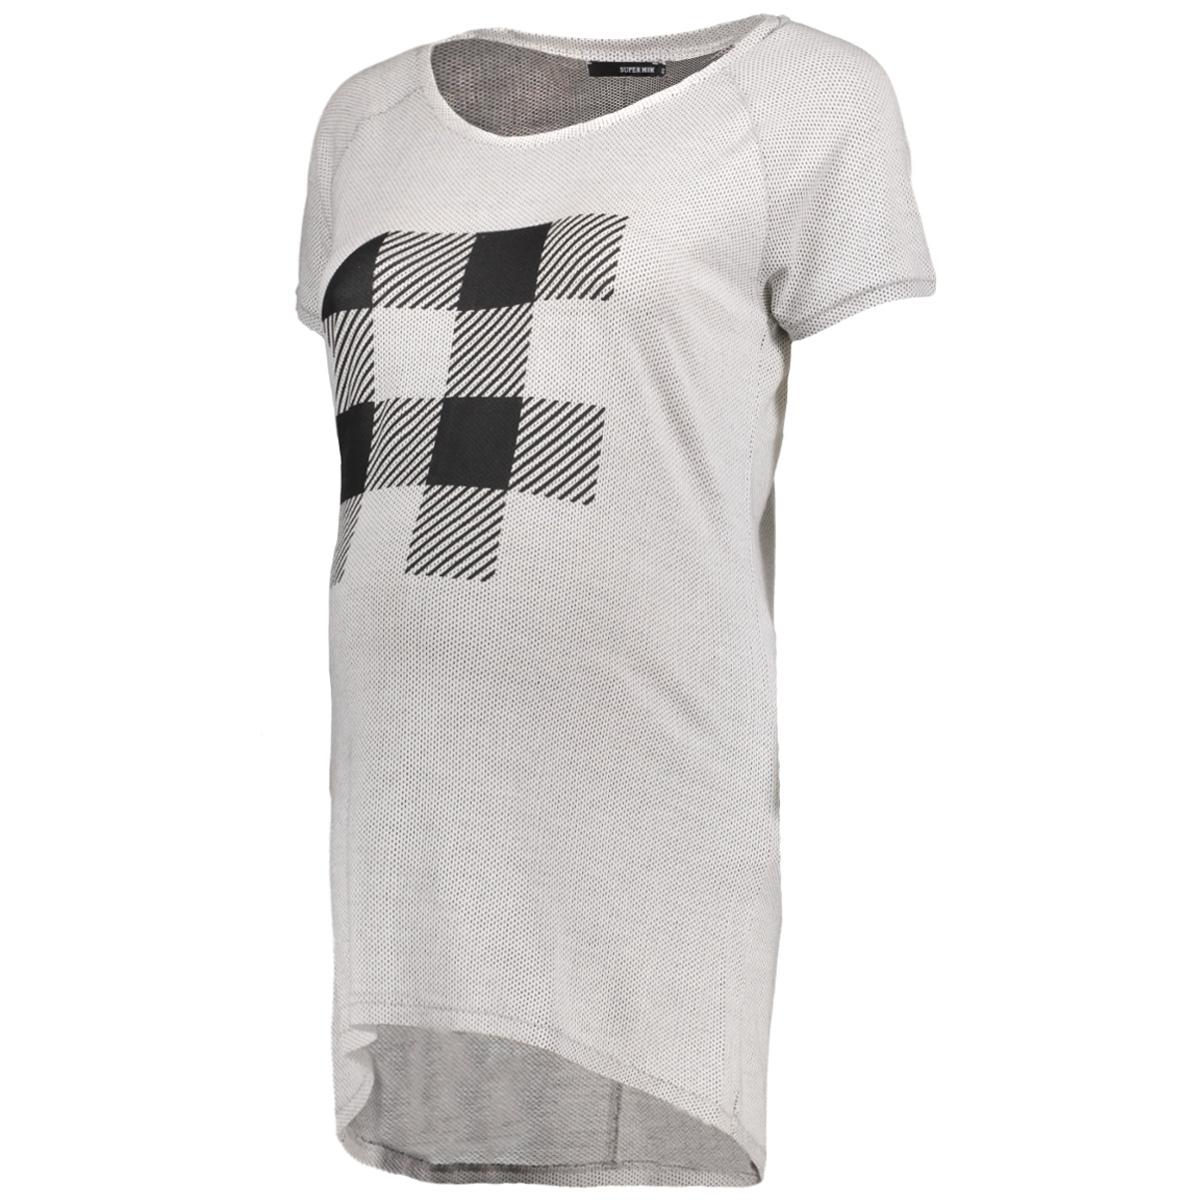 s0713 tee check supermom positie shirt light grey